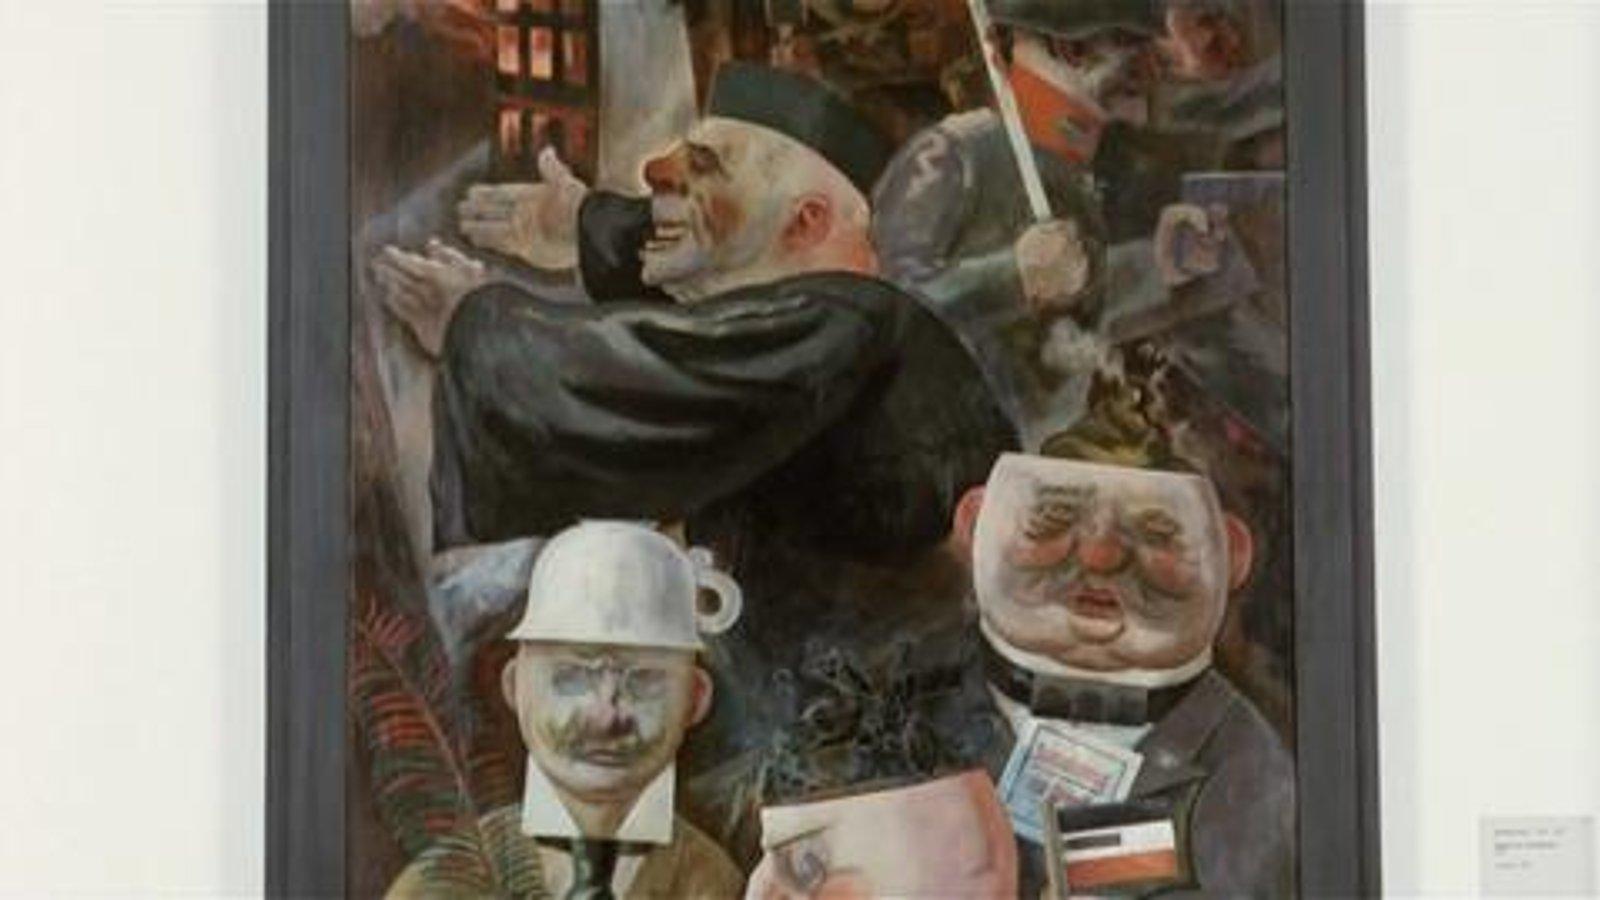 Kunstsammlung Nordrhein Westfalen - Duesseldorf - 1000 Masterpieces from the Great Museums of the World